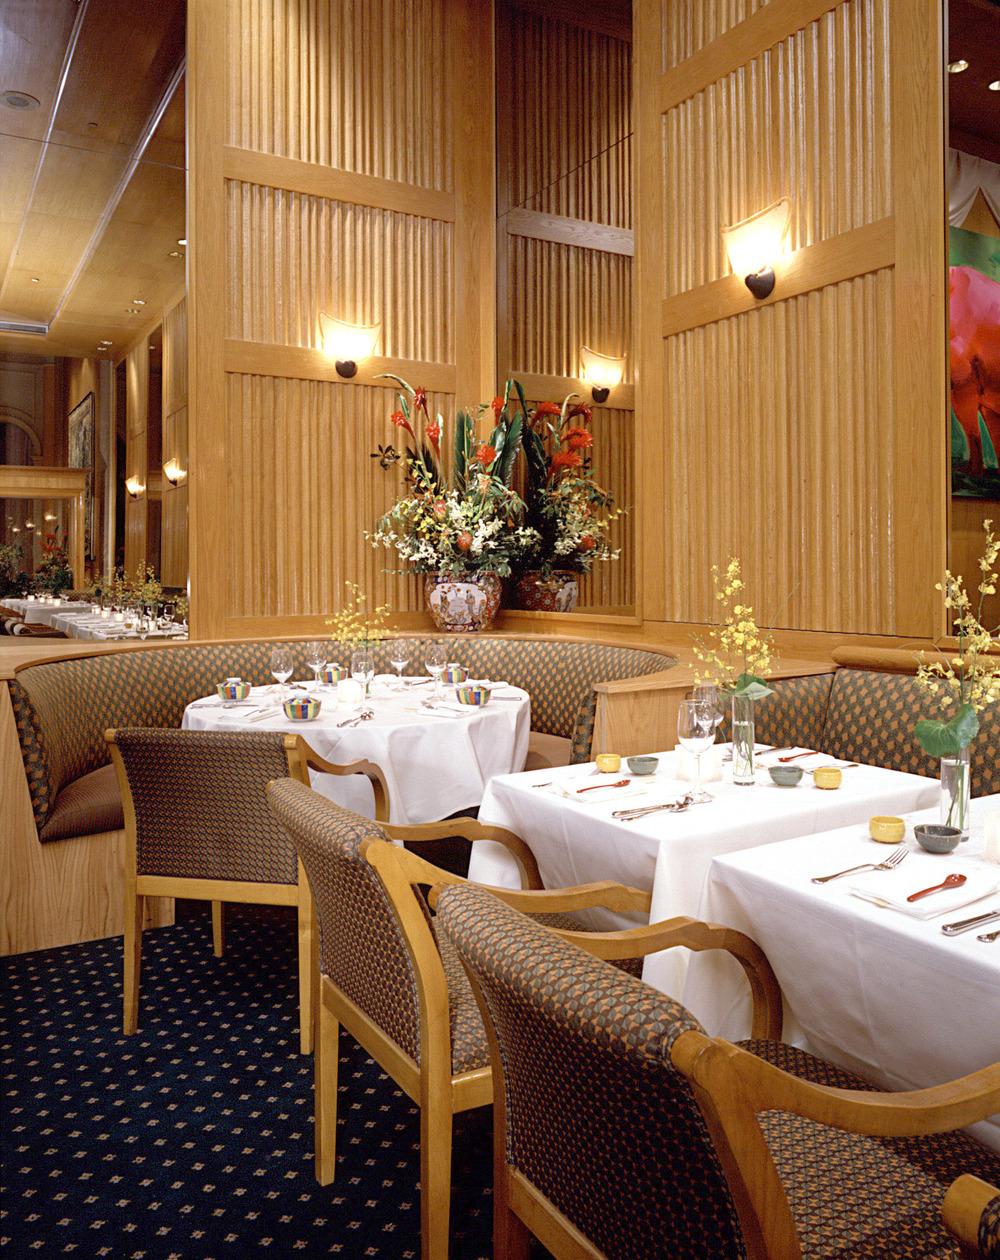 Tobin Parnes Design. Shin's Restaurant & Hotel Lobby. NYC. Hospitality Design. Restaurant. Millwork. Furniture. Seating.